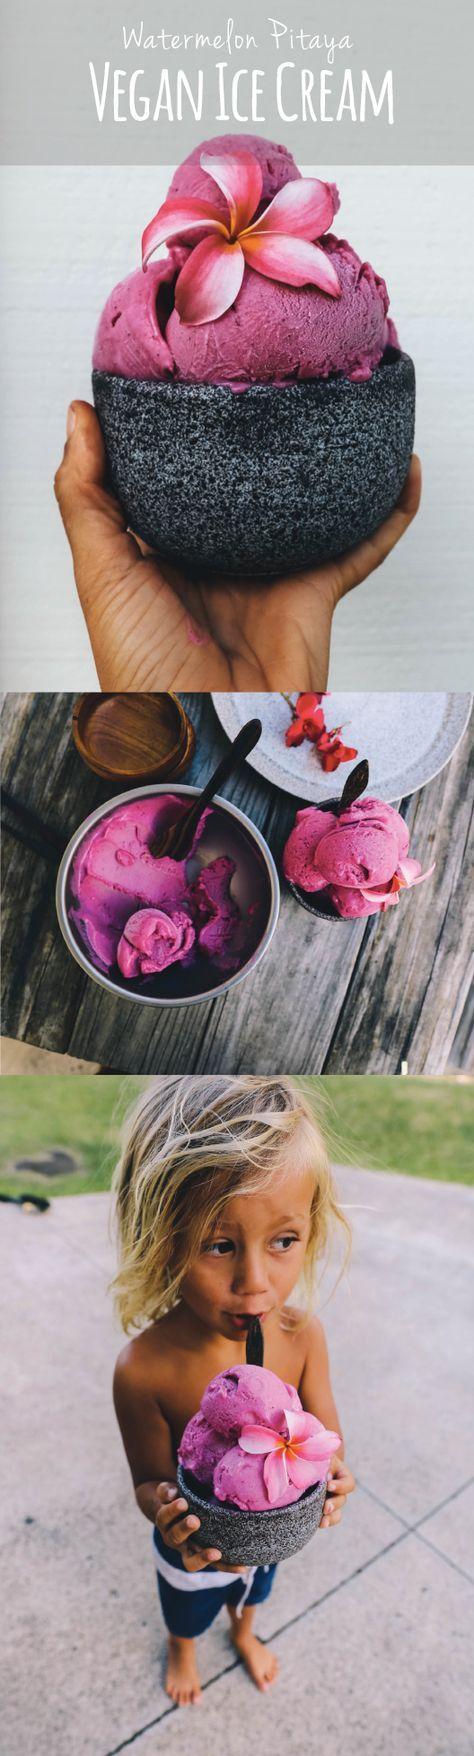 5 INGREDIENT NO APPLIANCE NEEDED to make creamy delicious plant based vegan ice-cream!